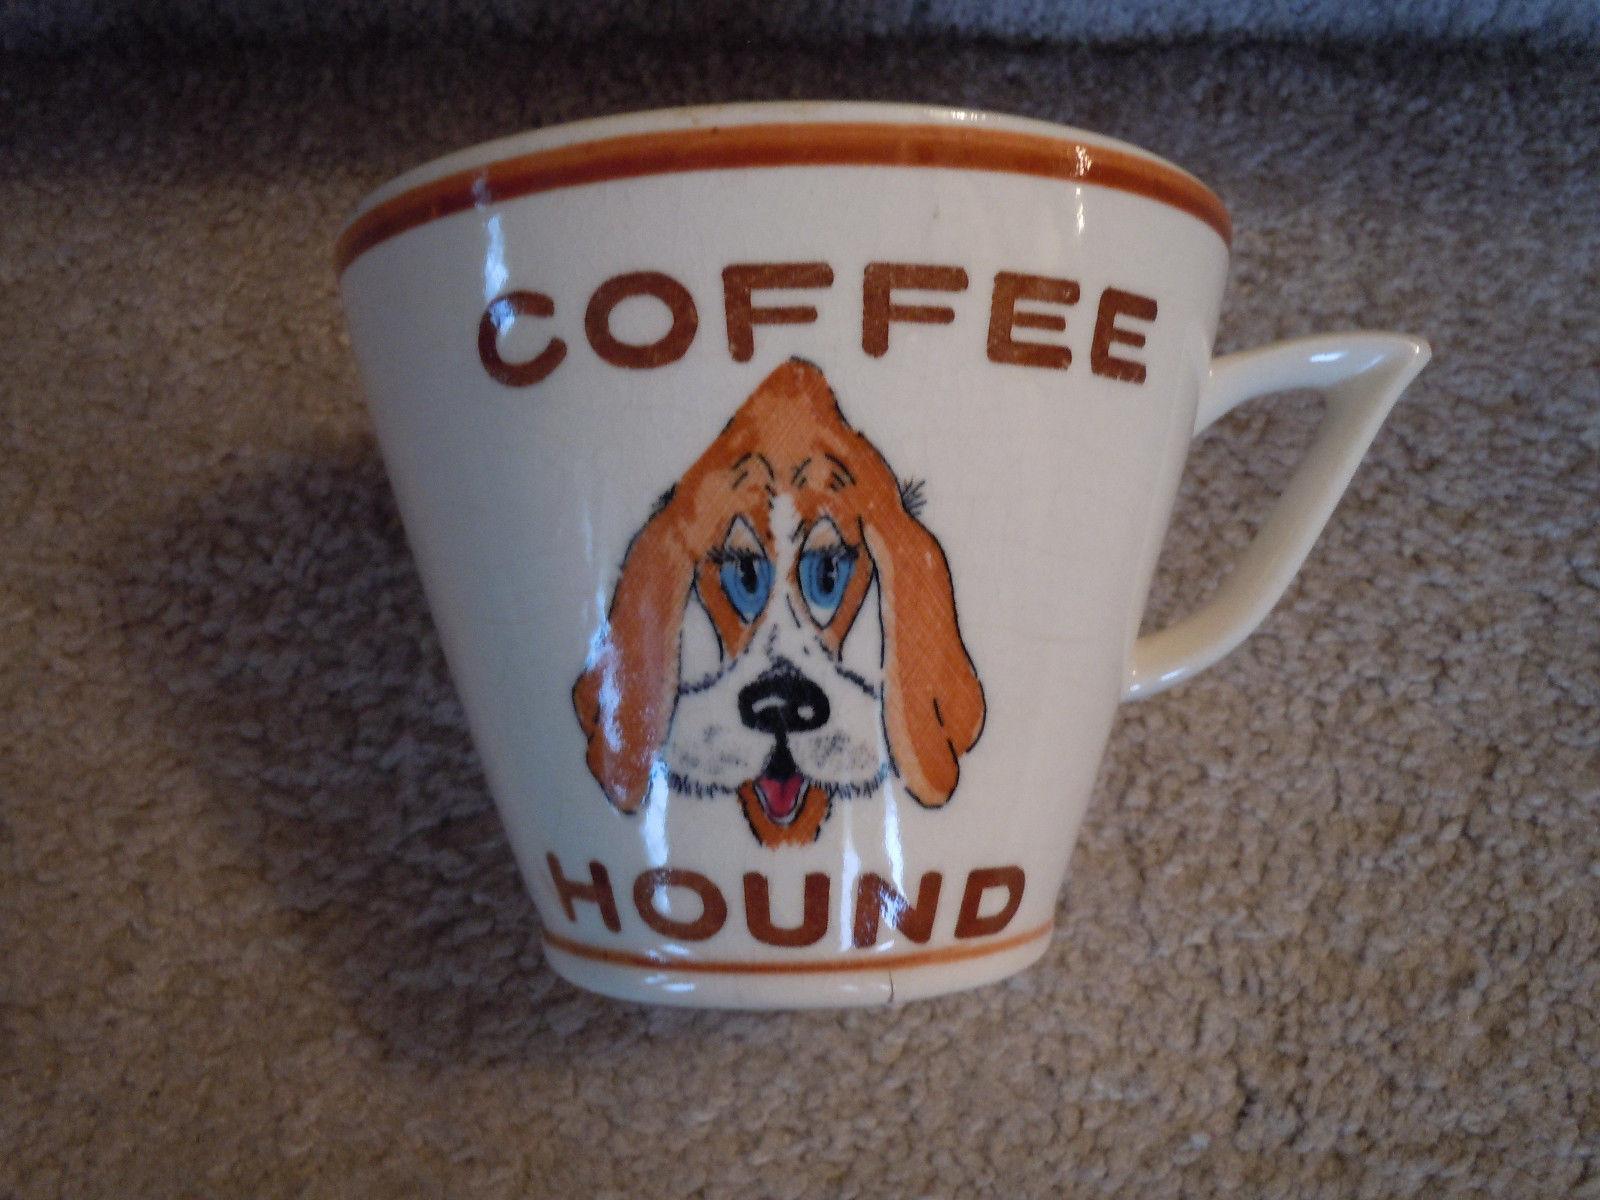 Vintage coffee hound mug